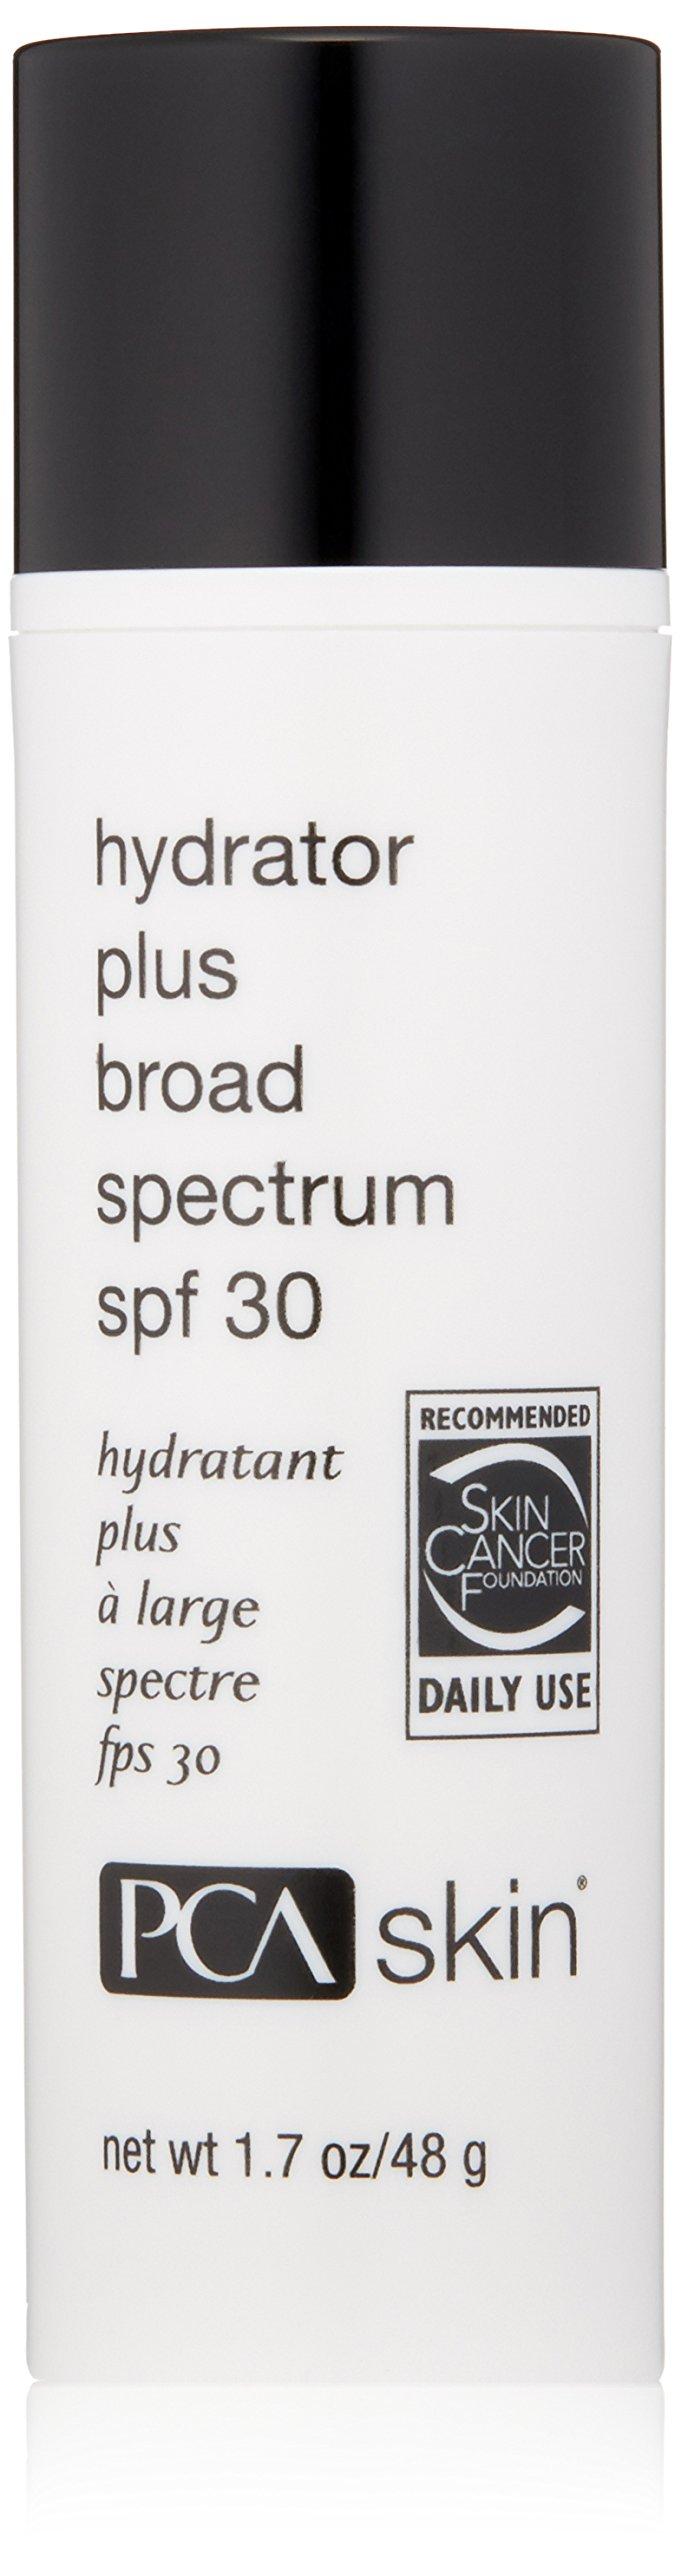 PCA SKIN Hydrator Plus Broad Spectrum spf 30, 1.7 oz.